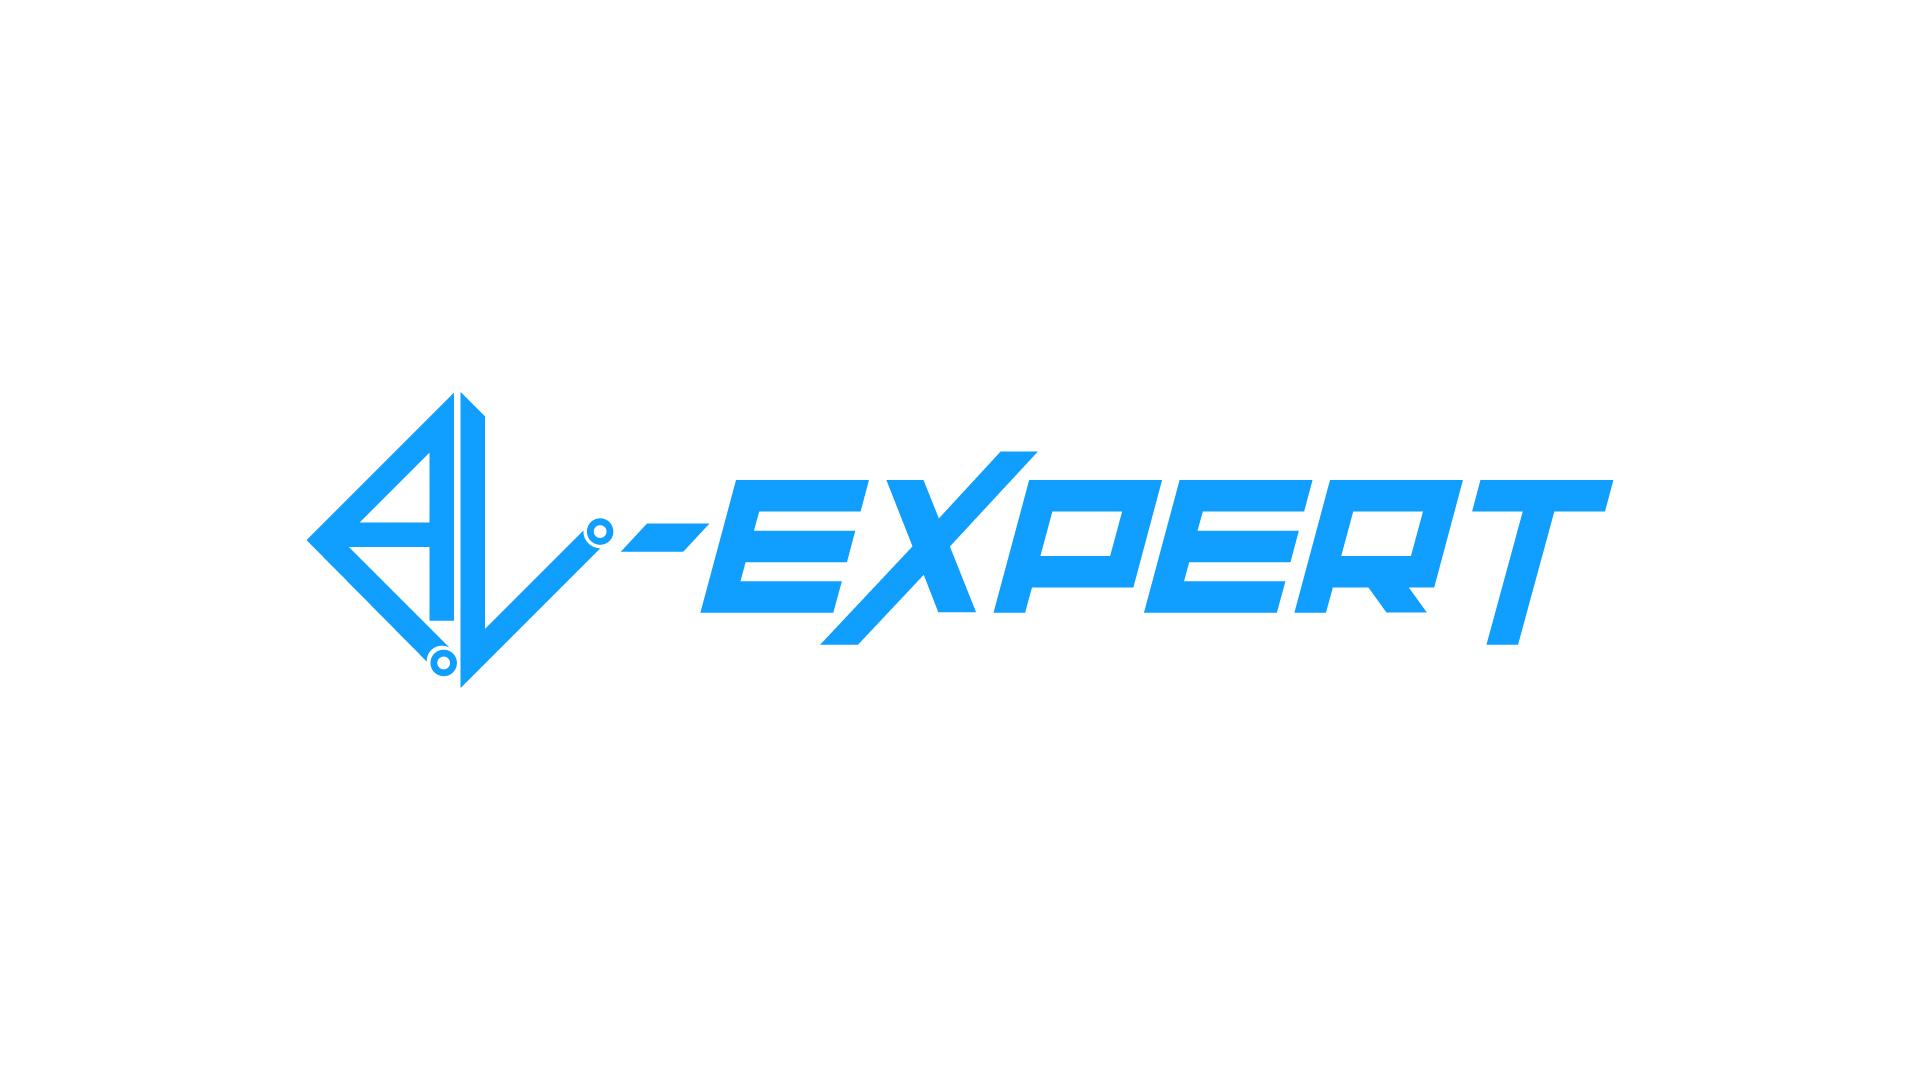 Создание логотипа, фирстиля фото f_2715c63dbf8aab37.jpg